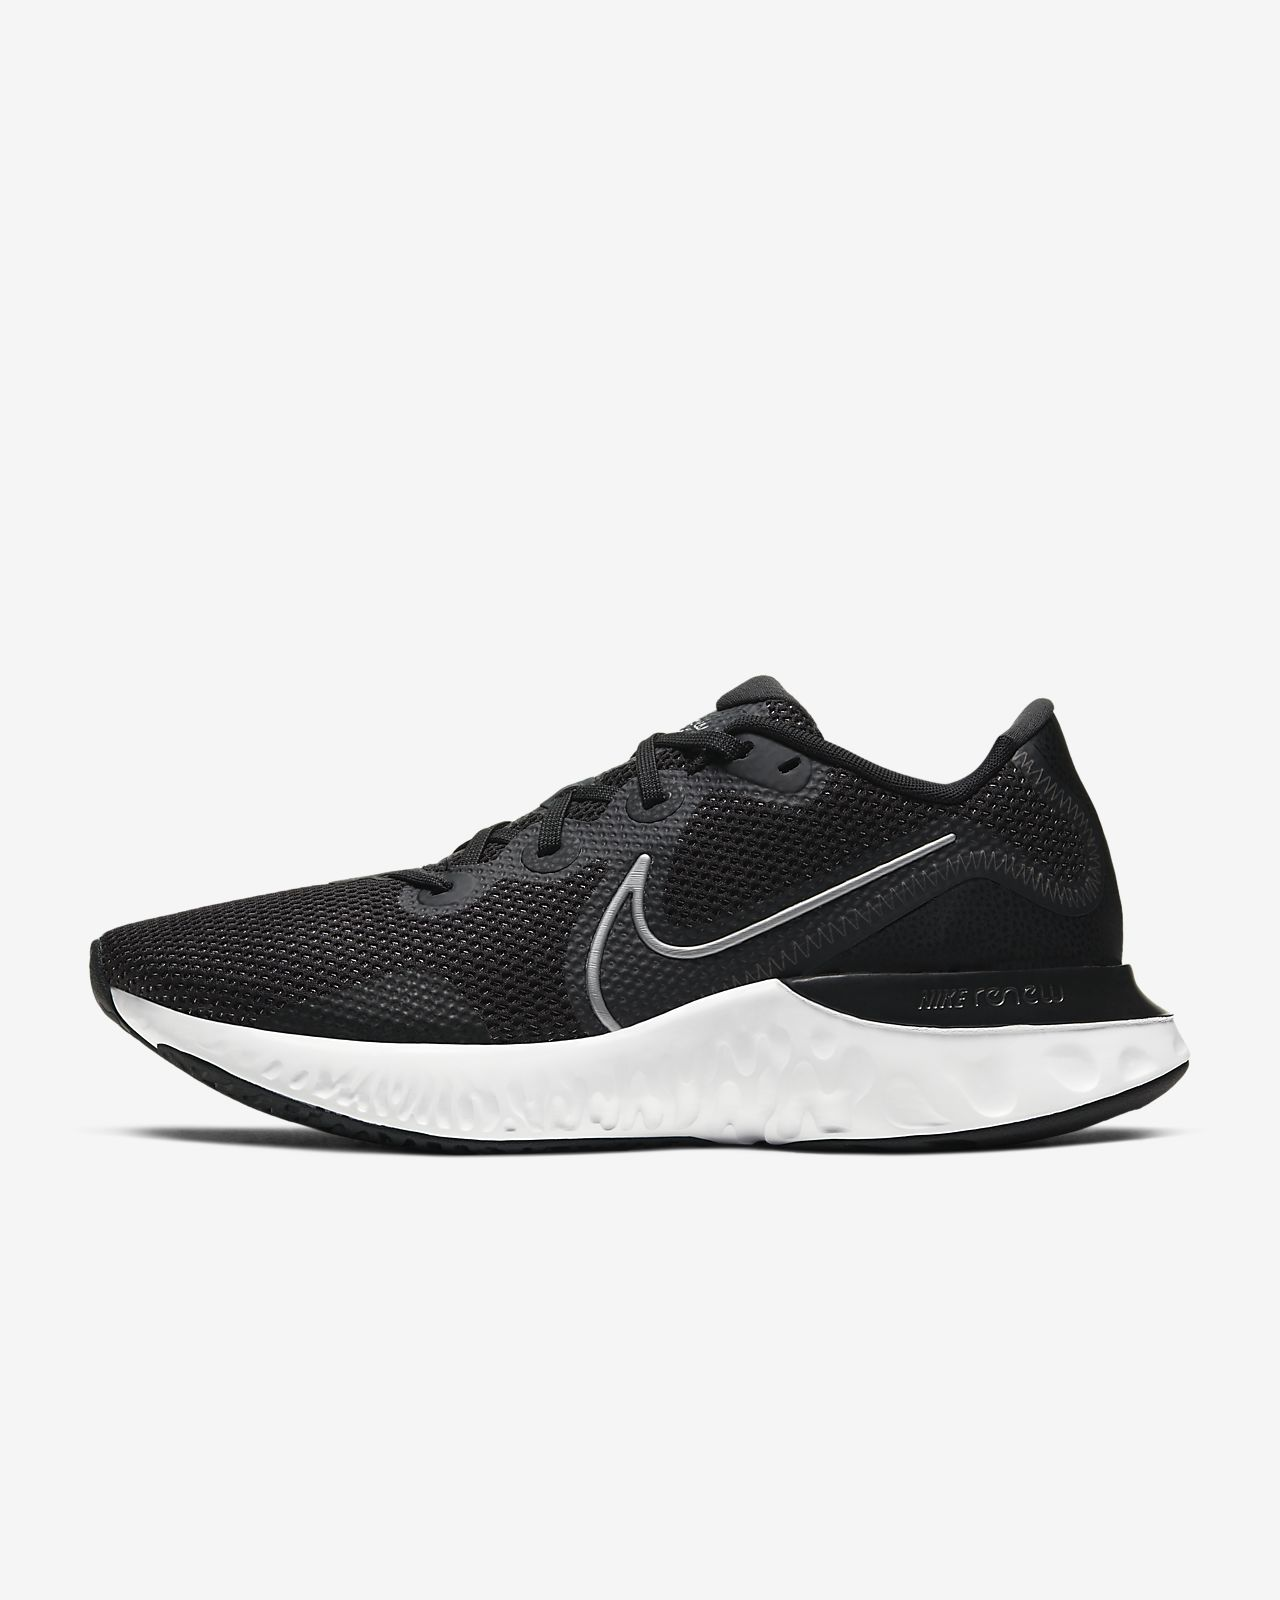 Chaussure de running Nike Renew Run pour Homme